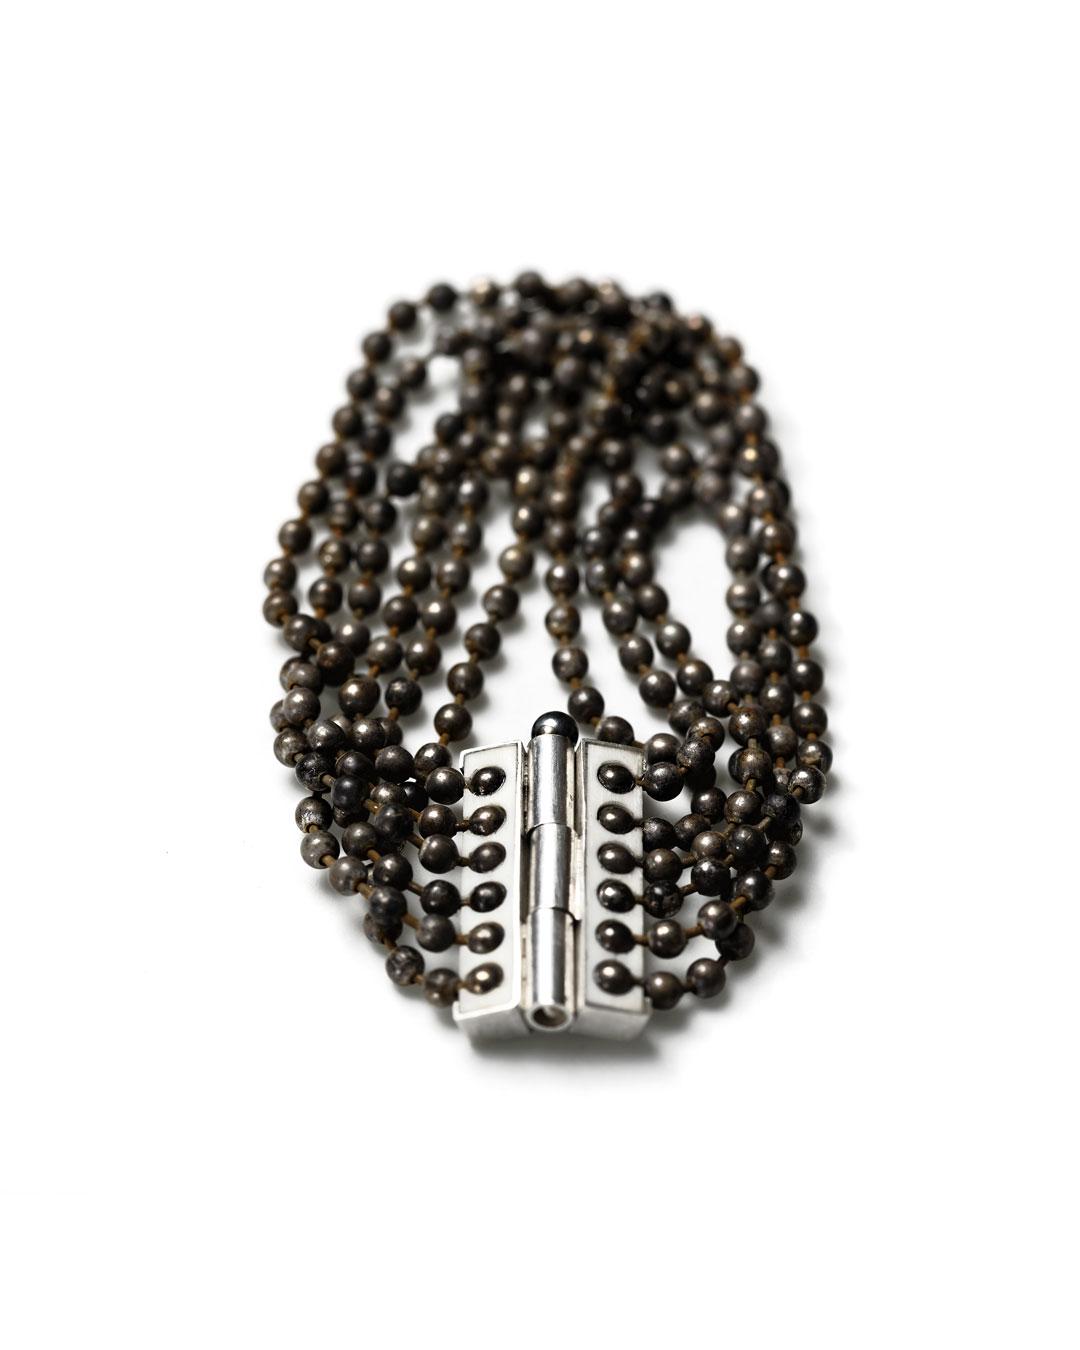 Julie Mollenhauer, untitled, 2015, bracelet; iron, silver, bone, 70 x 32 x 4 mm, €1080